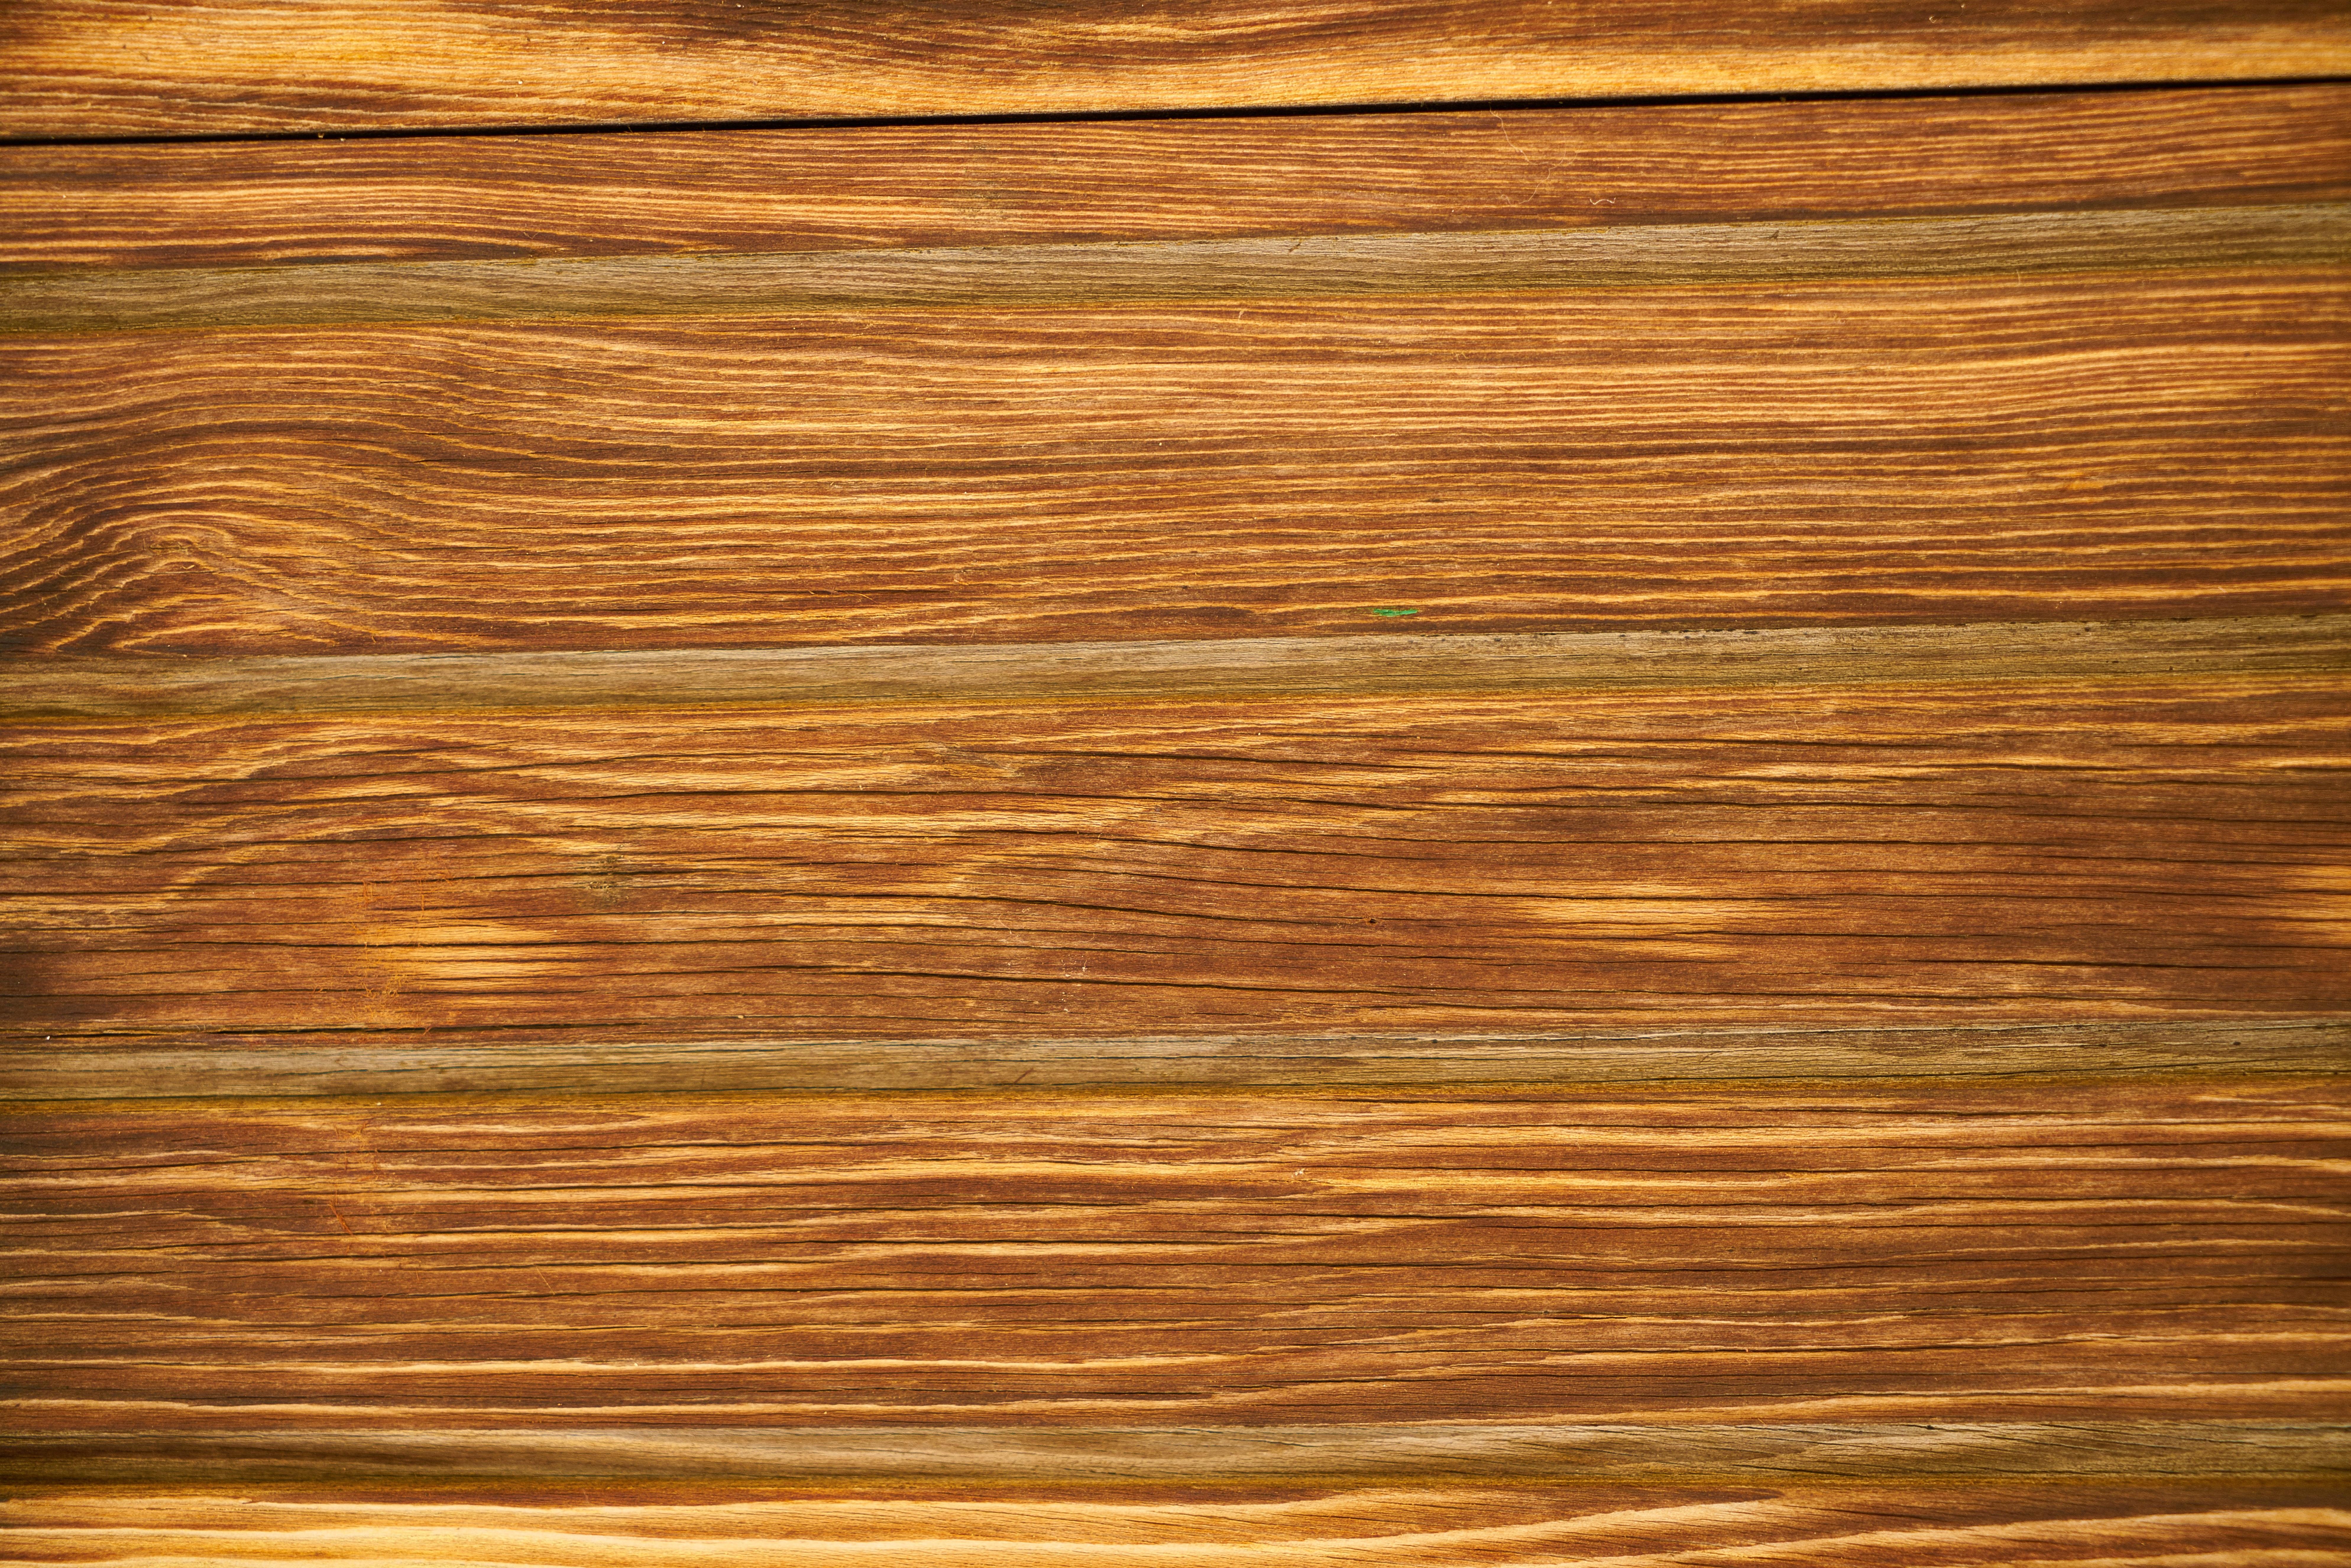 Fotos gratis : mesa, árbol, textura, piso, antiguo, patrón, macro ...